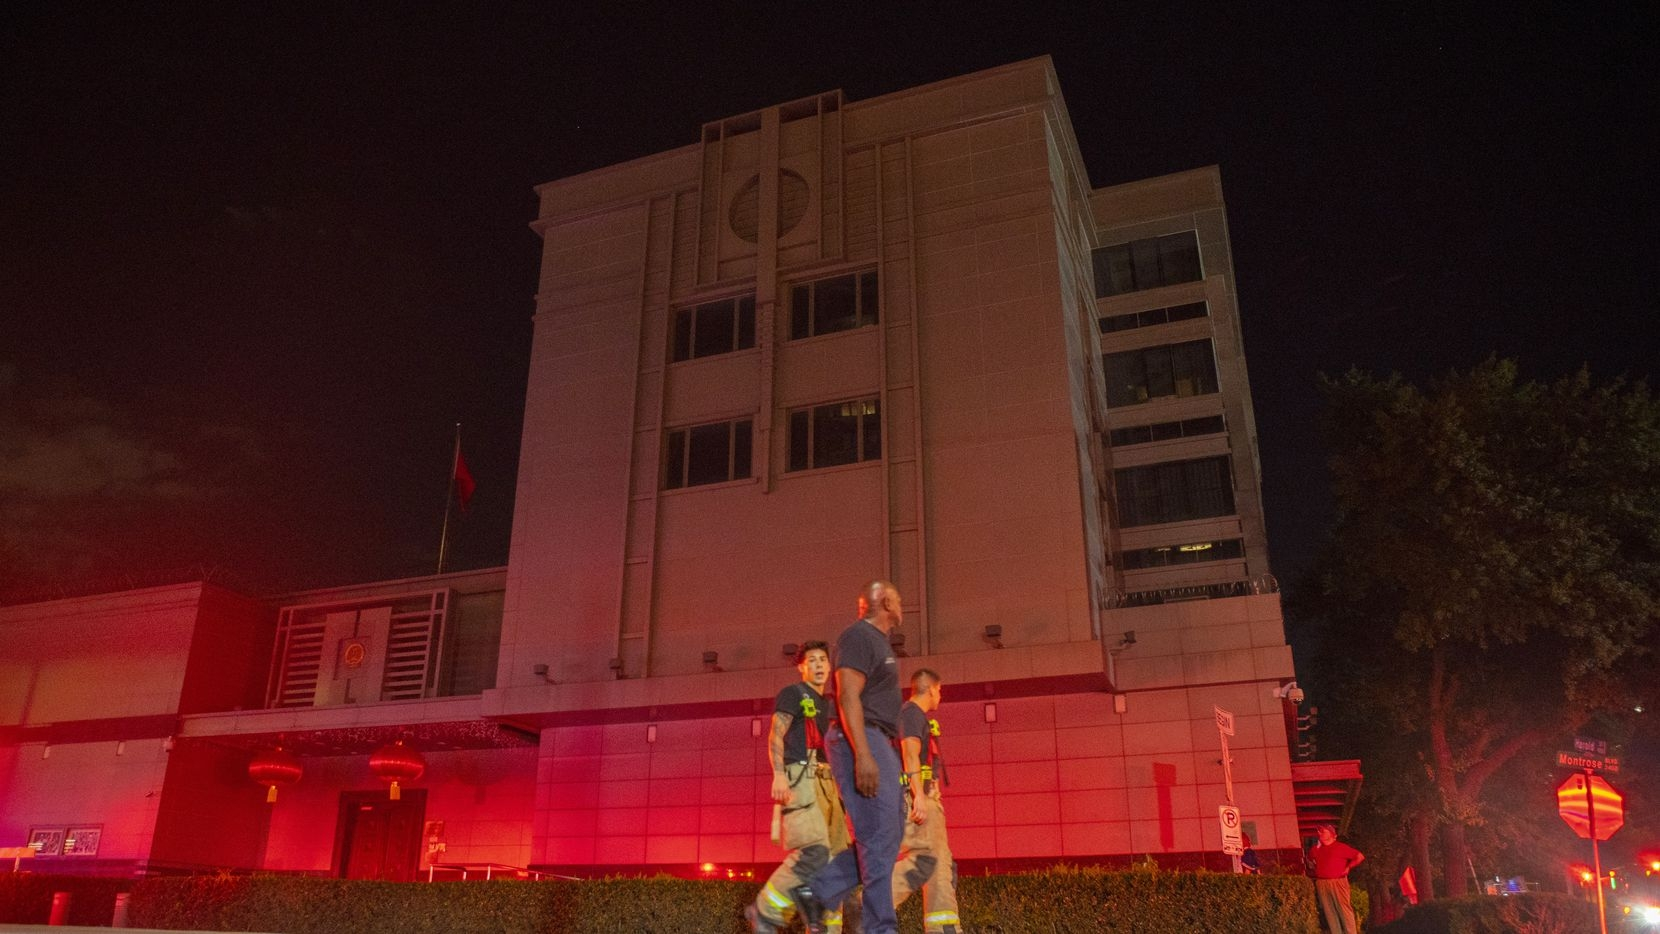 world breaking news today july 23 china blasts houston consulate shutdown as trump election gambit